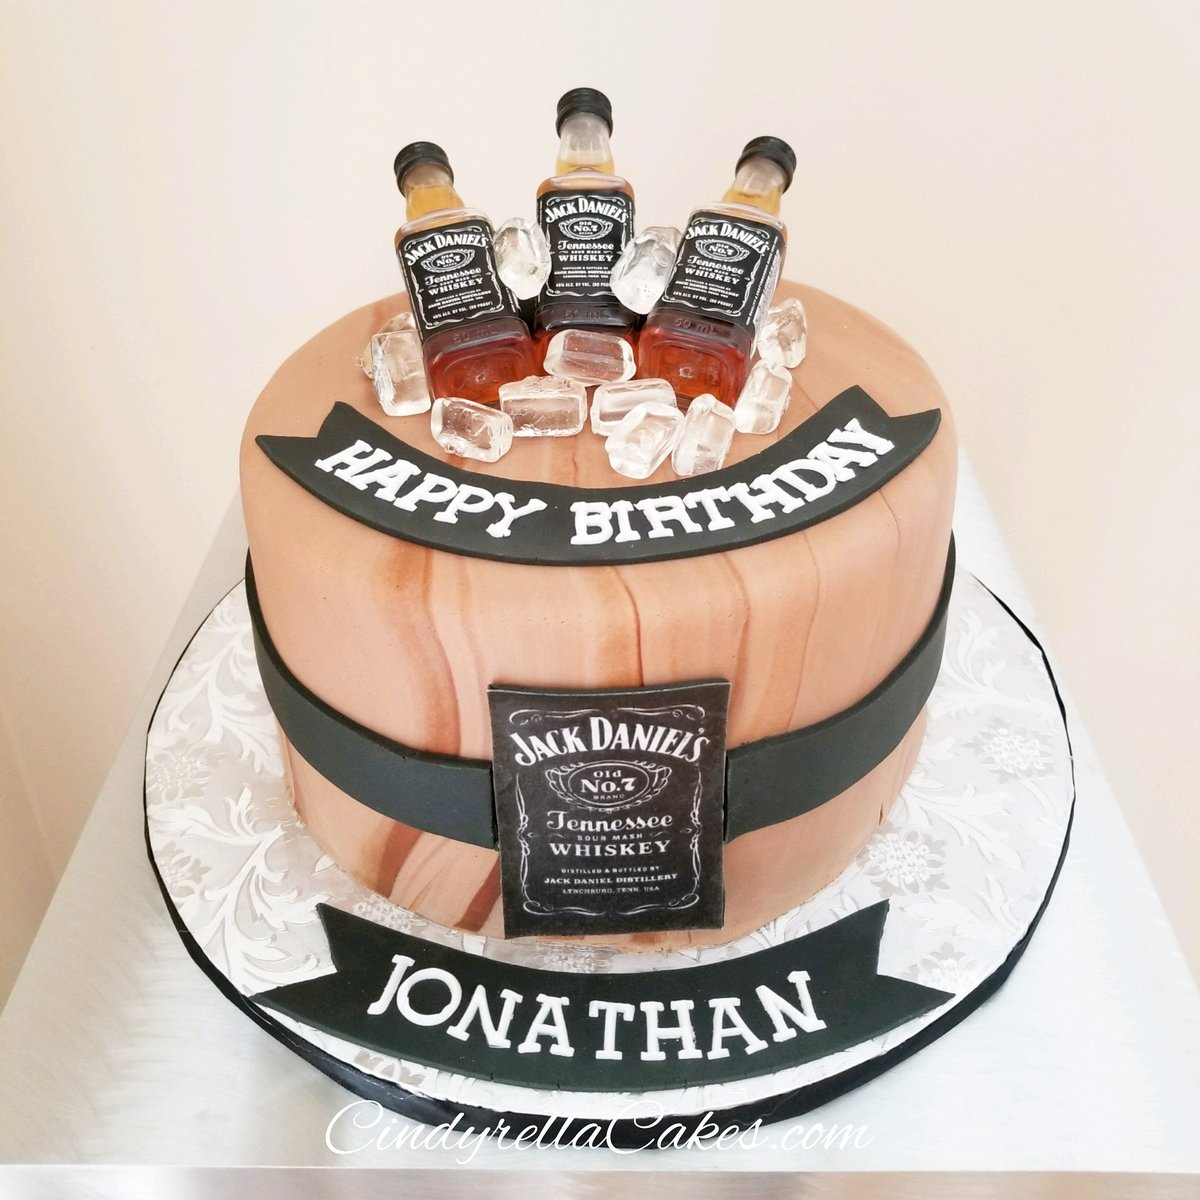 Super Cindyrella Cakes On Twitter Jack Daniels Birthday Cake Personalised Birthday Cards Sponlily Jamesorg